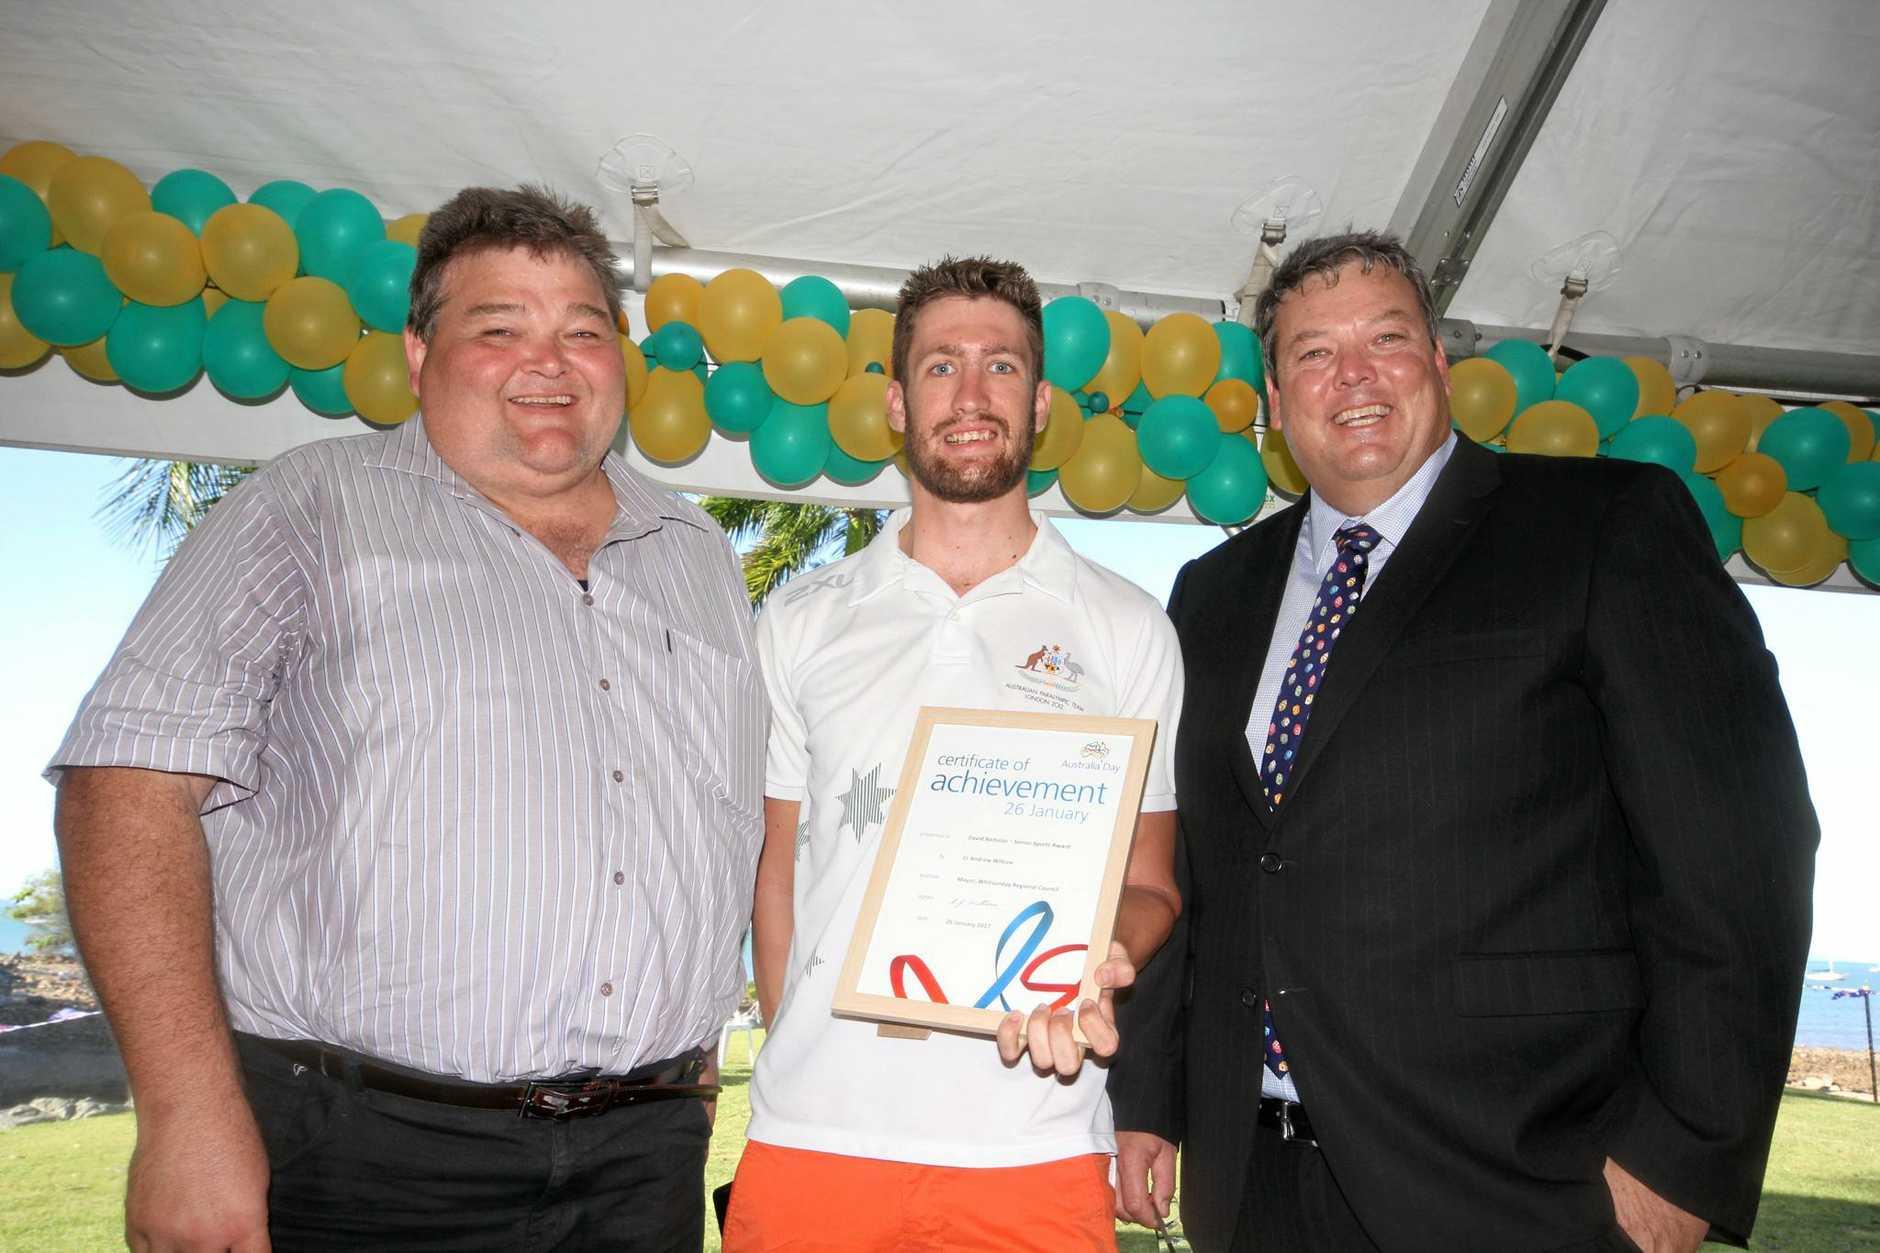 Cr John Collins with senior sports award David Nicholas and mayor Andrew Willcox.